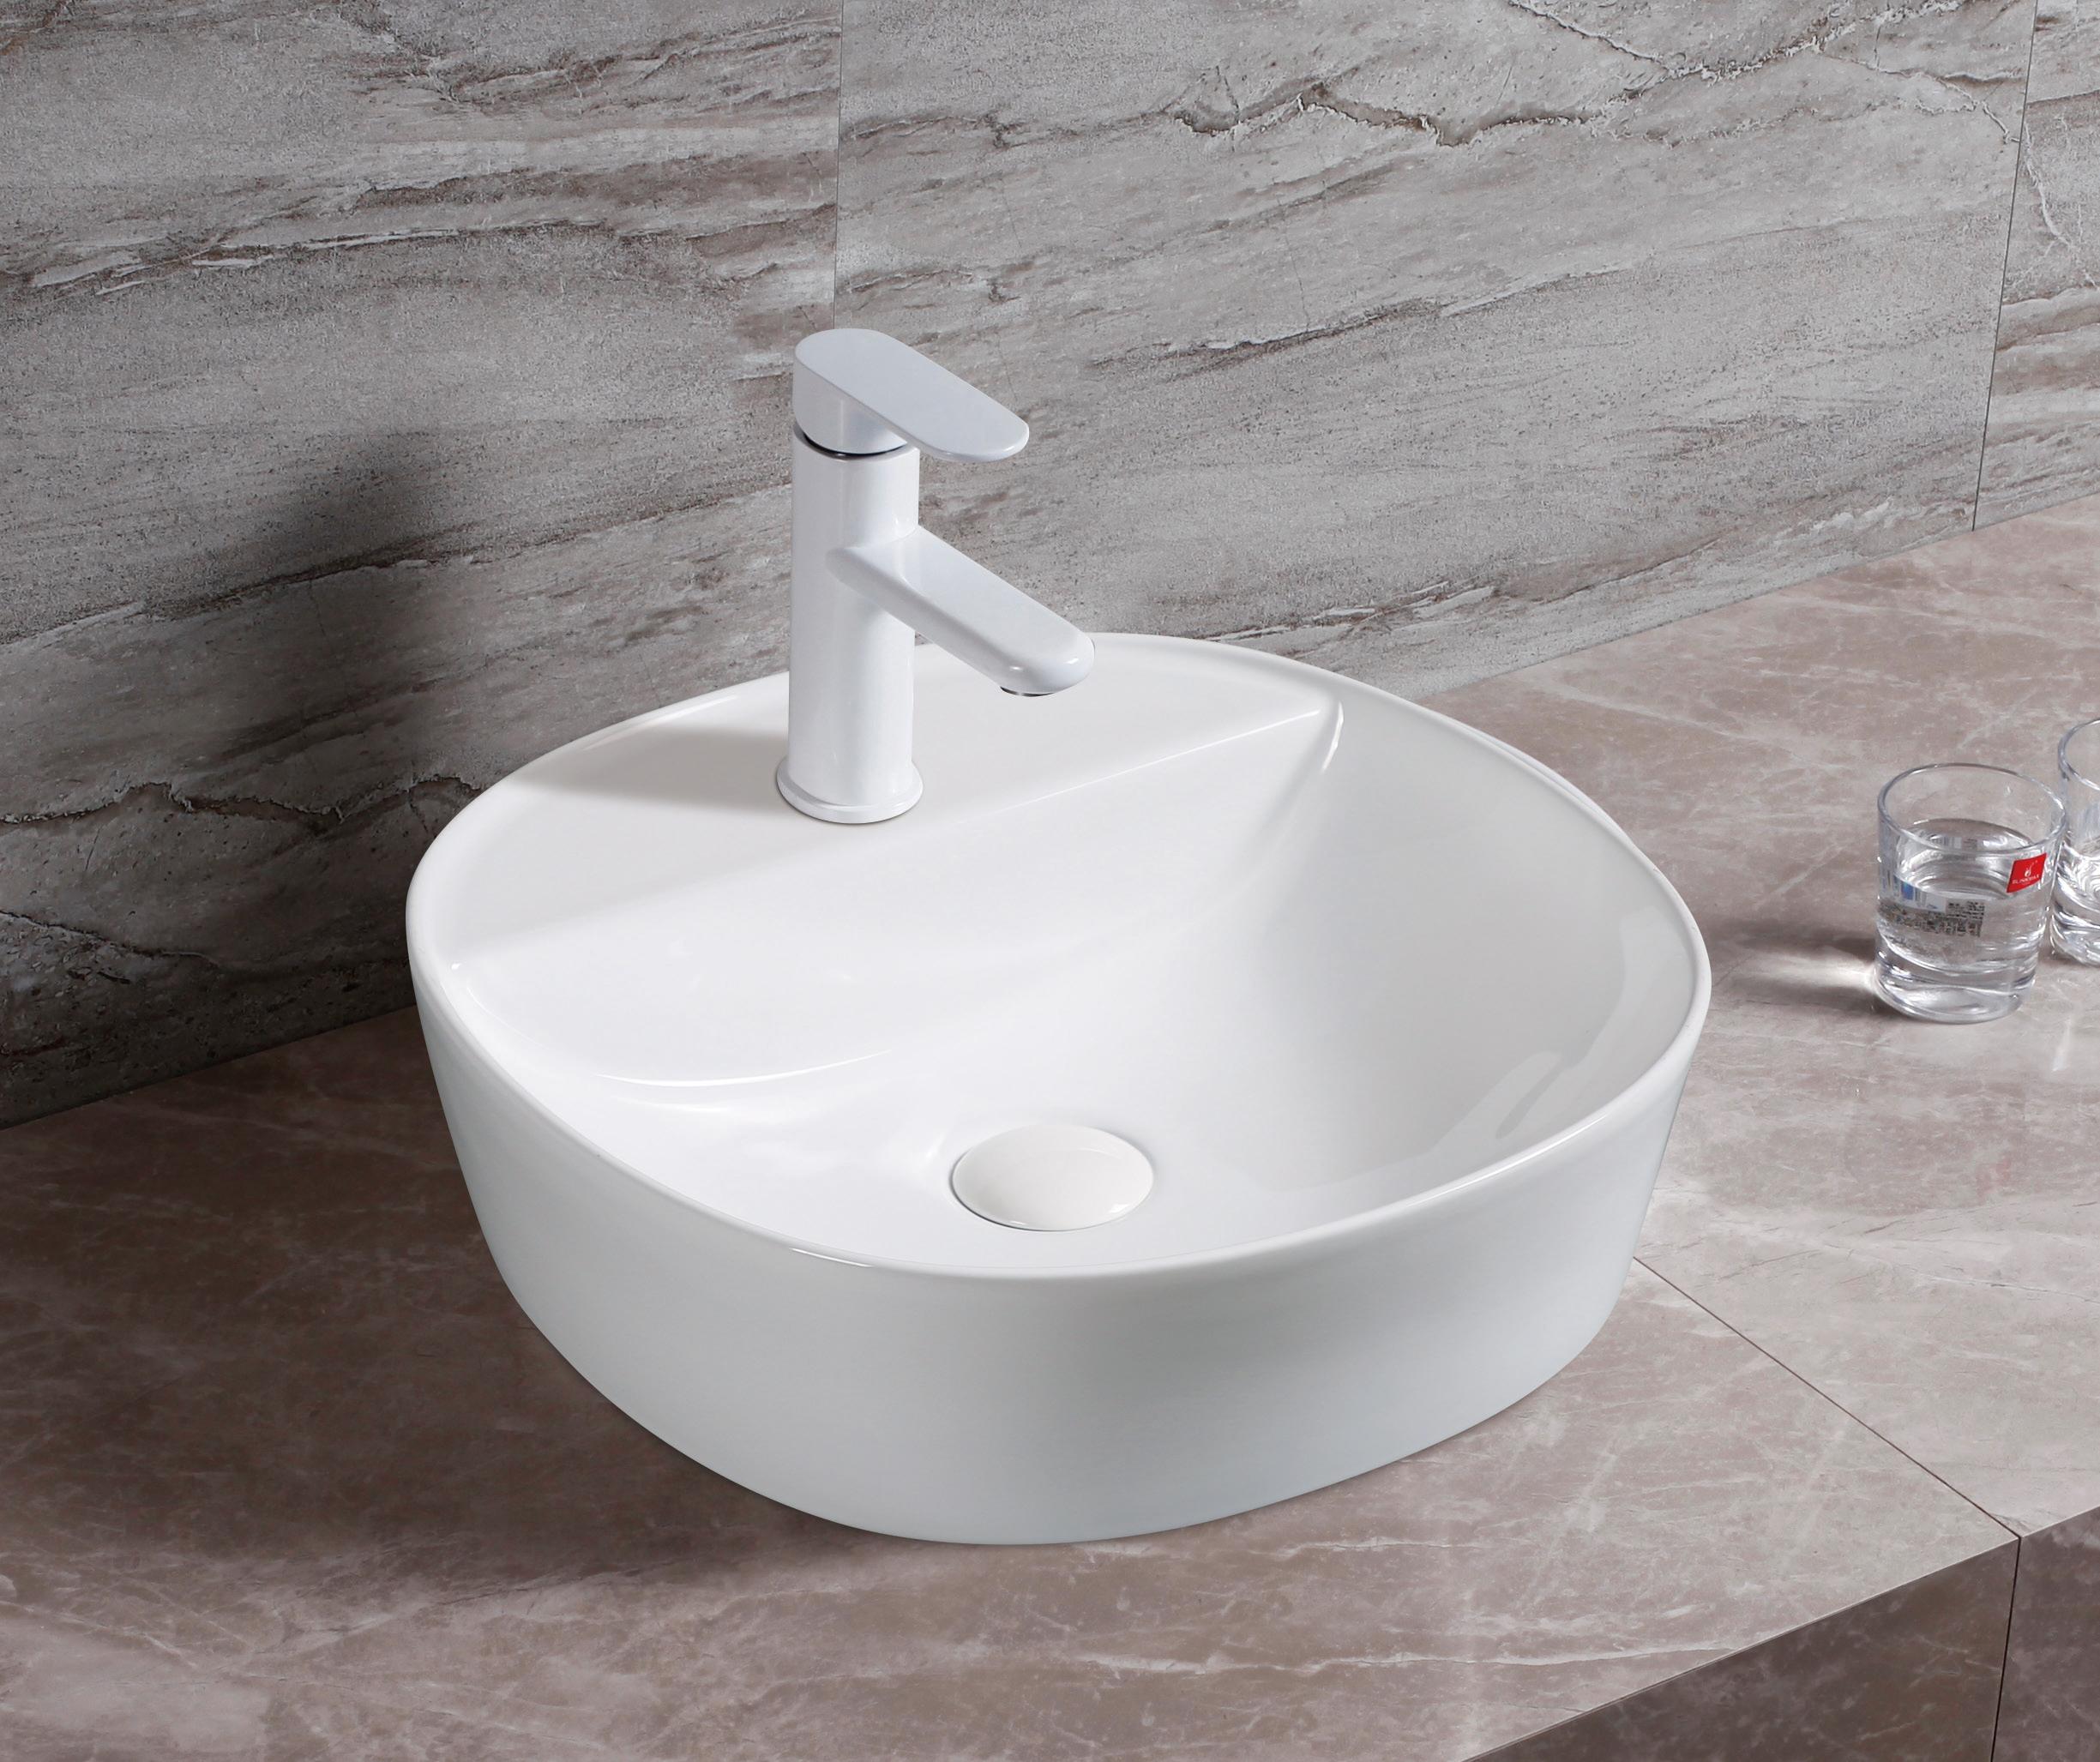 Sanitary Ware - Chaozhou Bodini Ceramics Factory Co., Ltd.